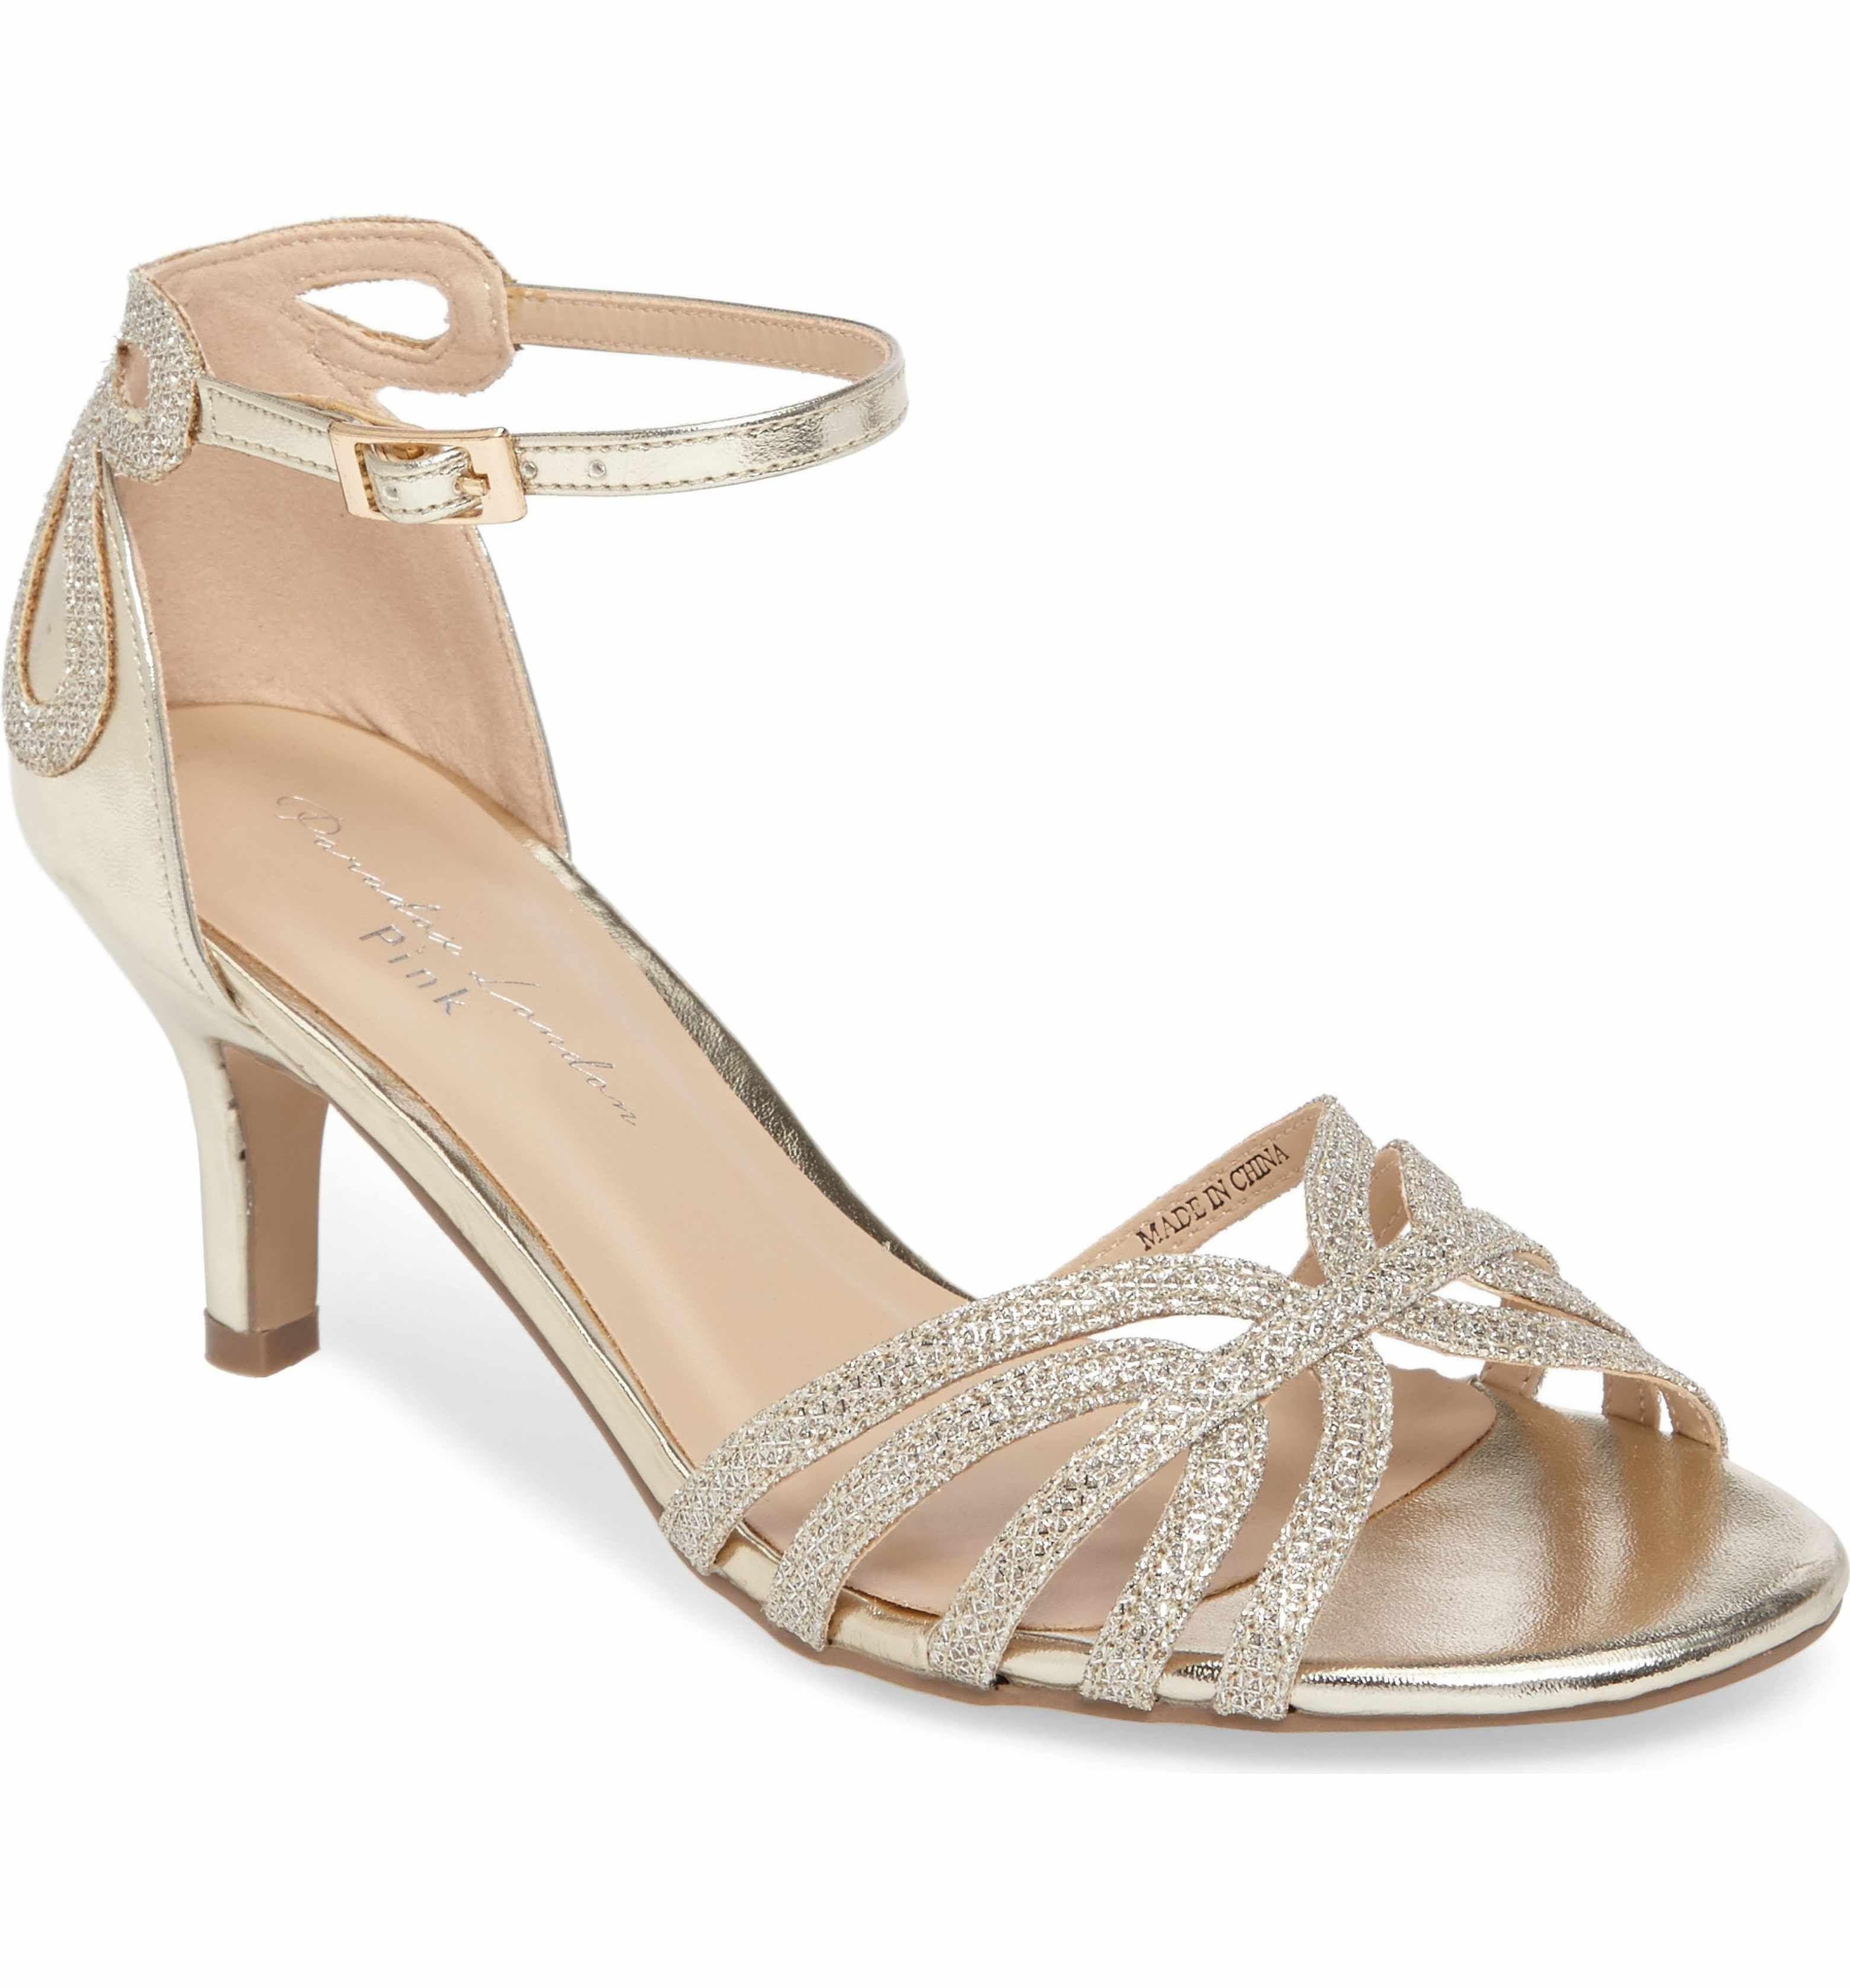 e0260e59f158 Main Image - pink paradox london Melby Ankle Strap Sandal (Women)